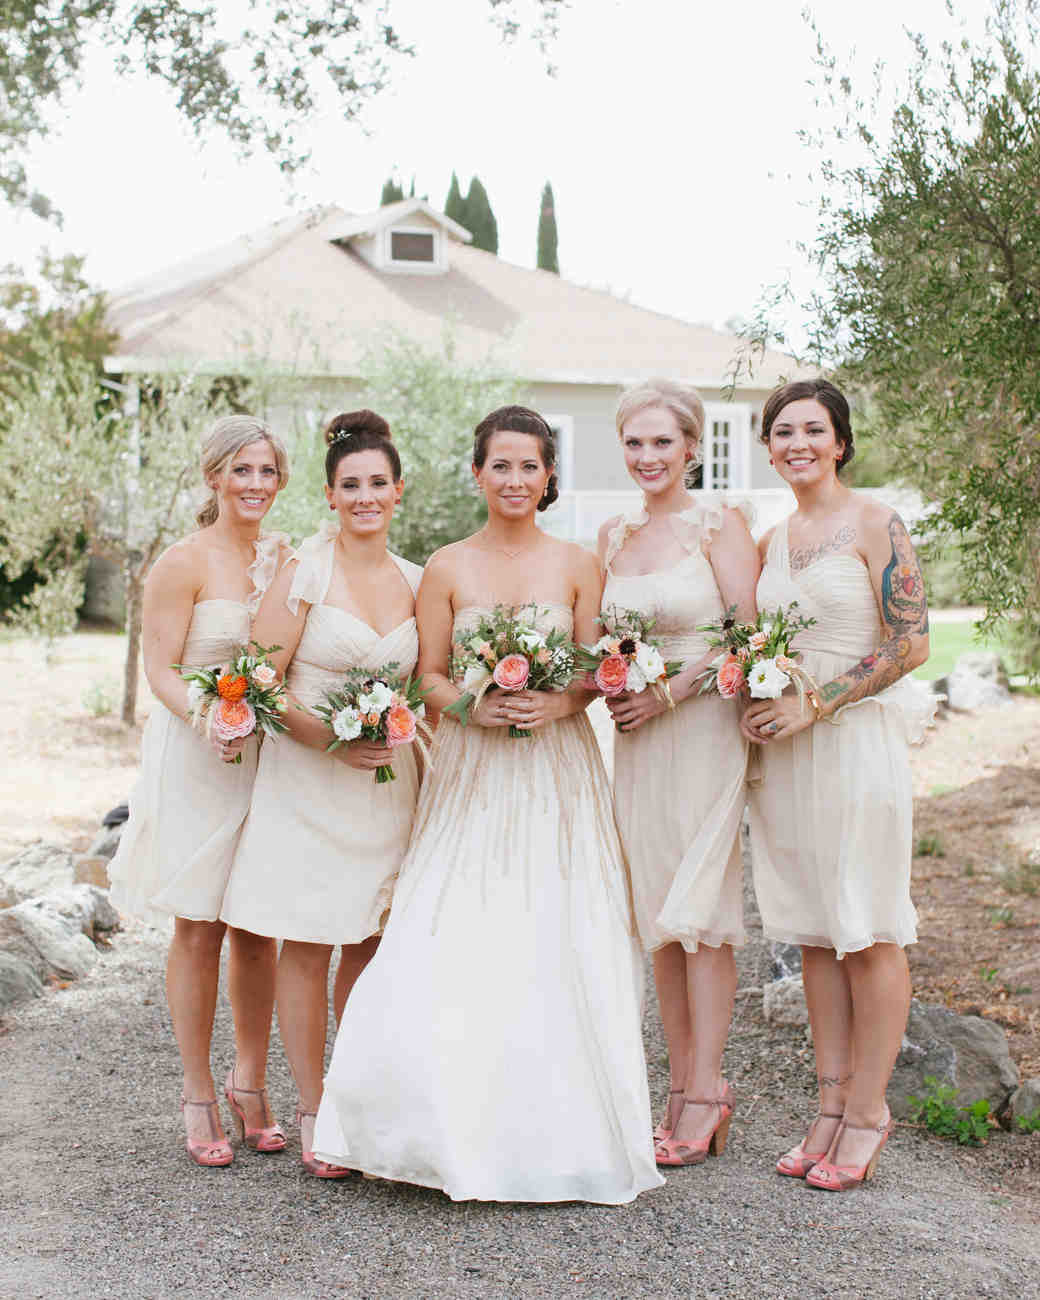 julia-dave-wedding-bridesmaids2-0414.jpg